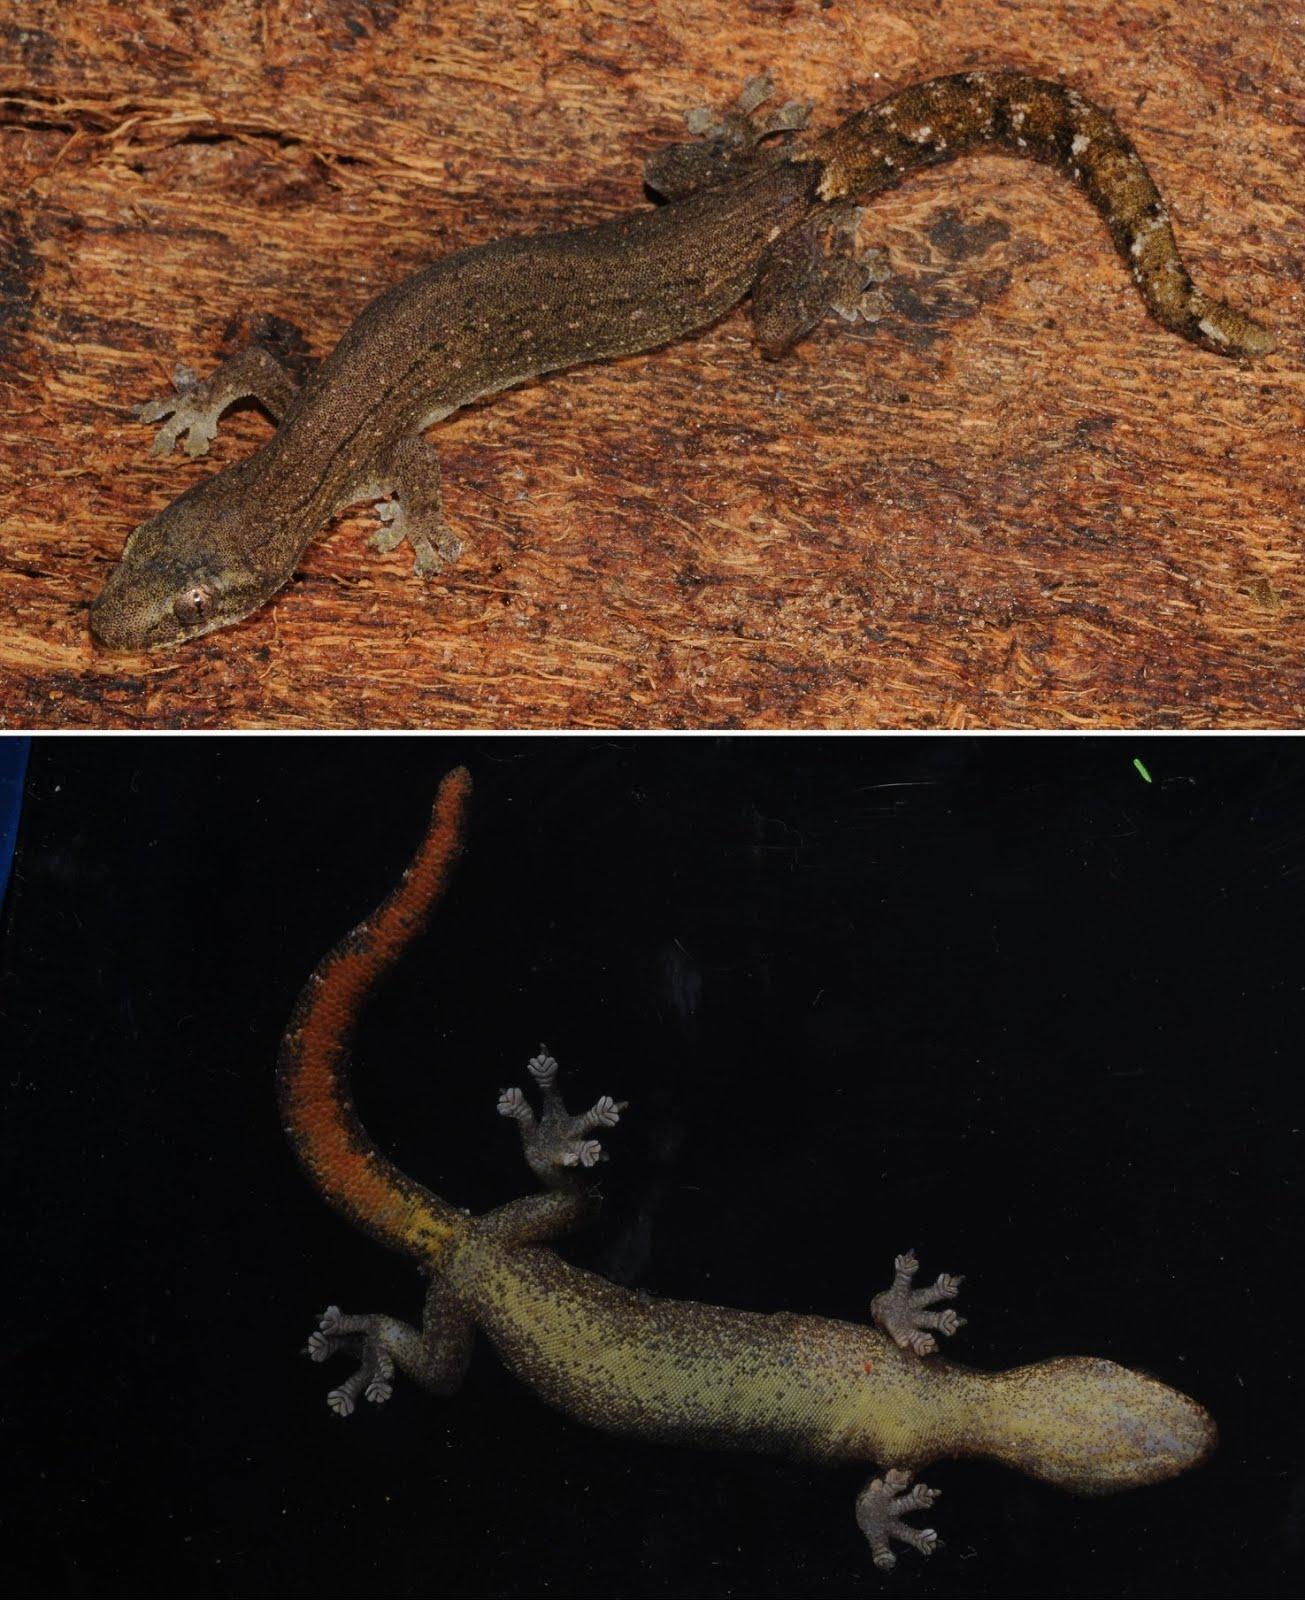 Hemiphyllodactylus jnana